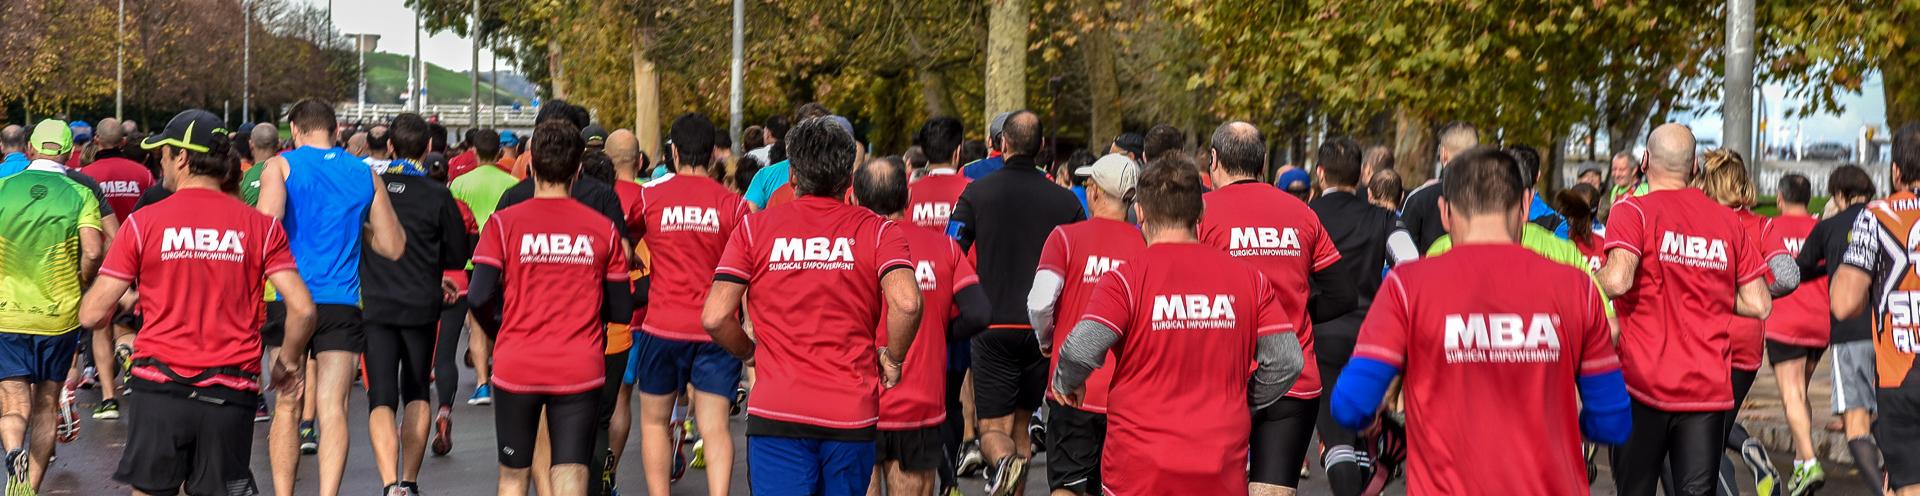 Responsabilidad Social Corporativa - MBA